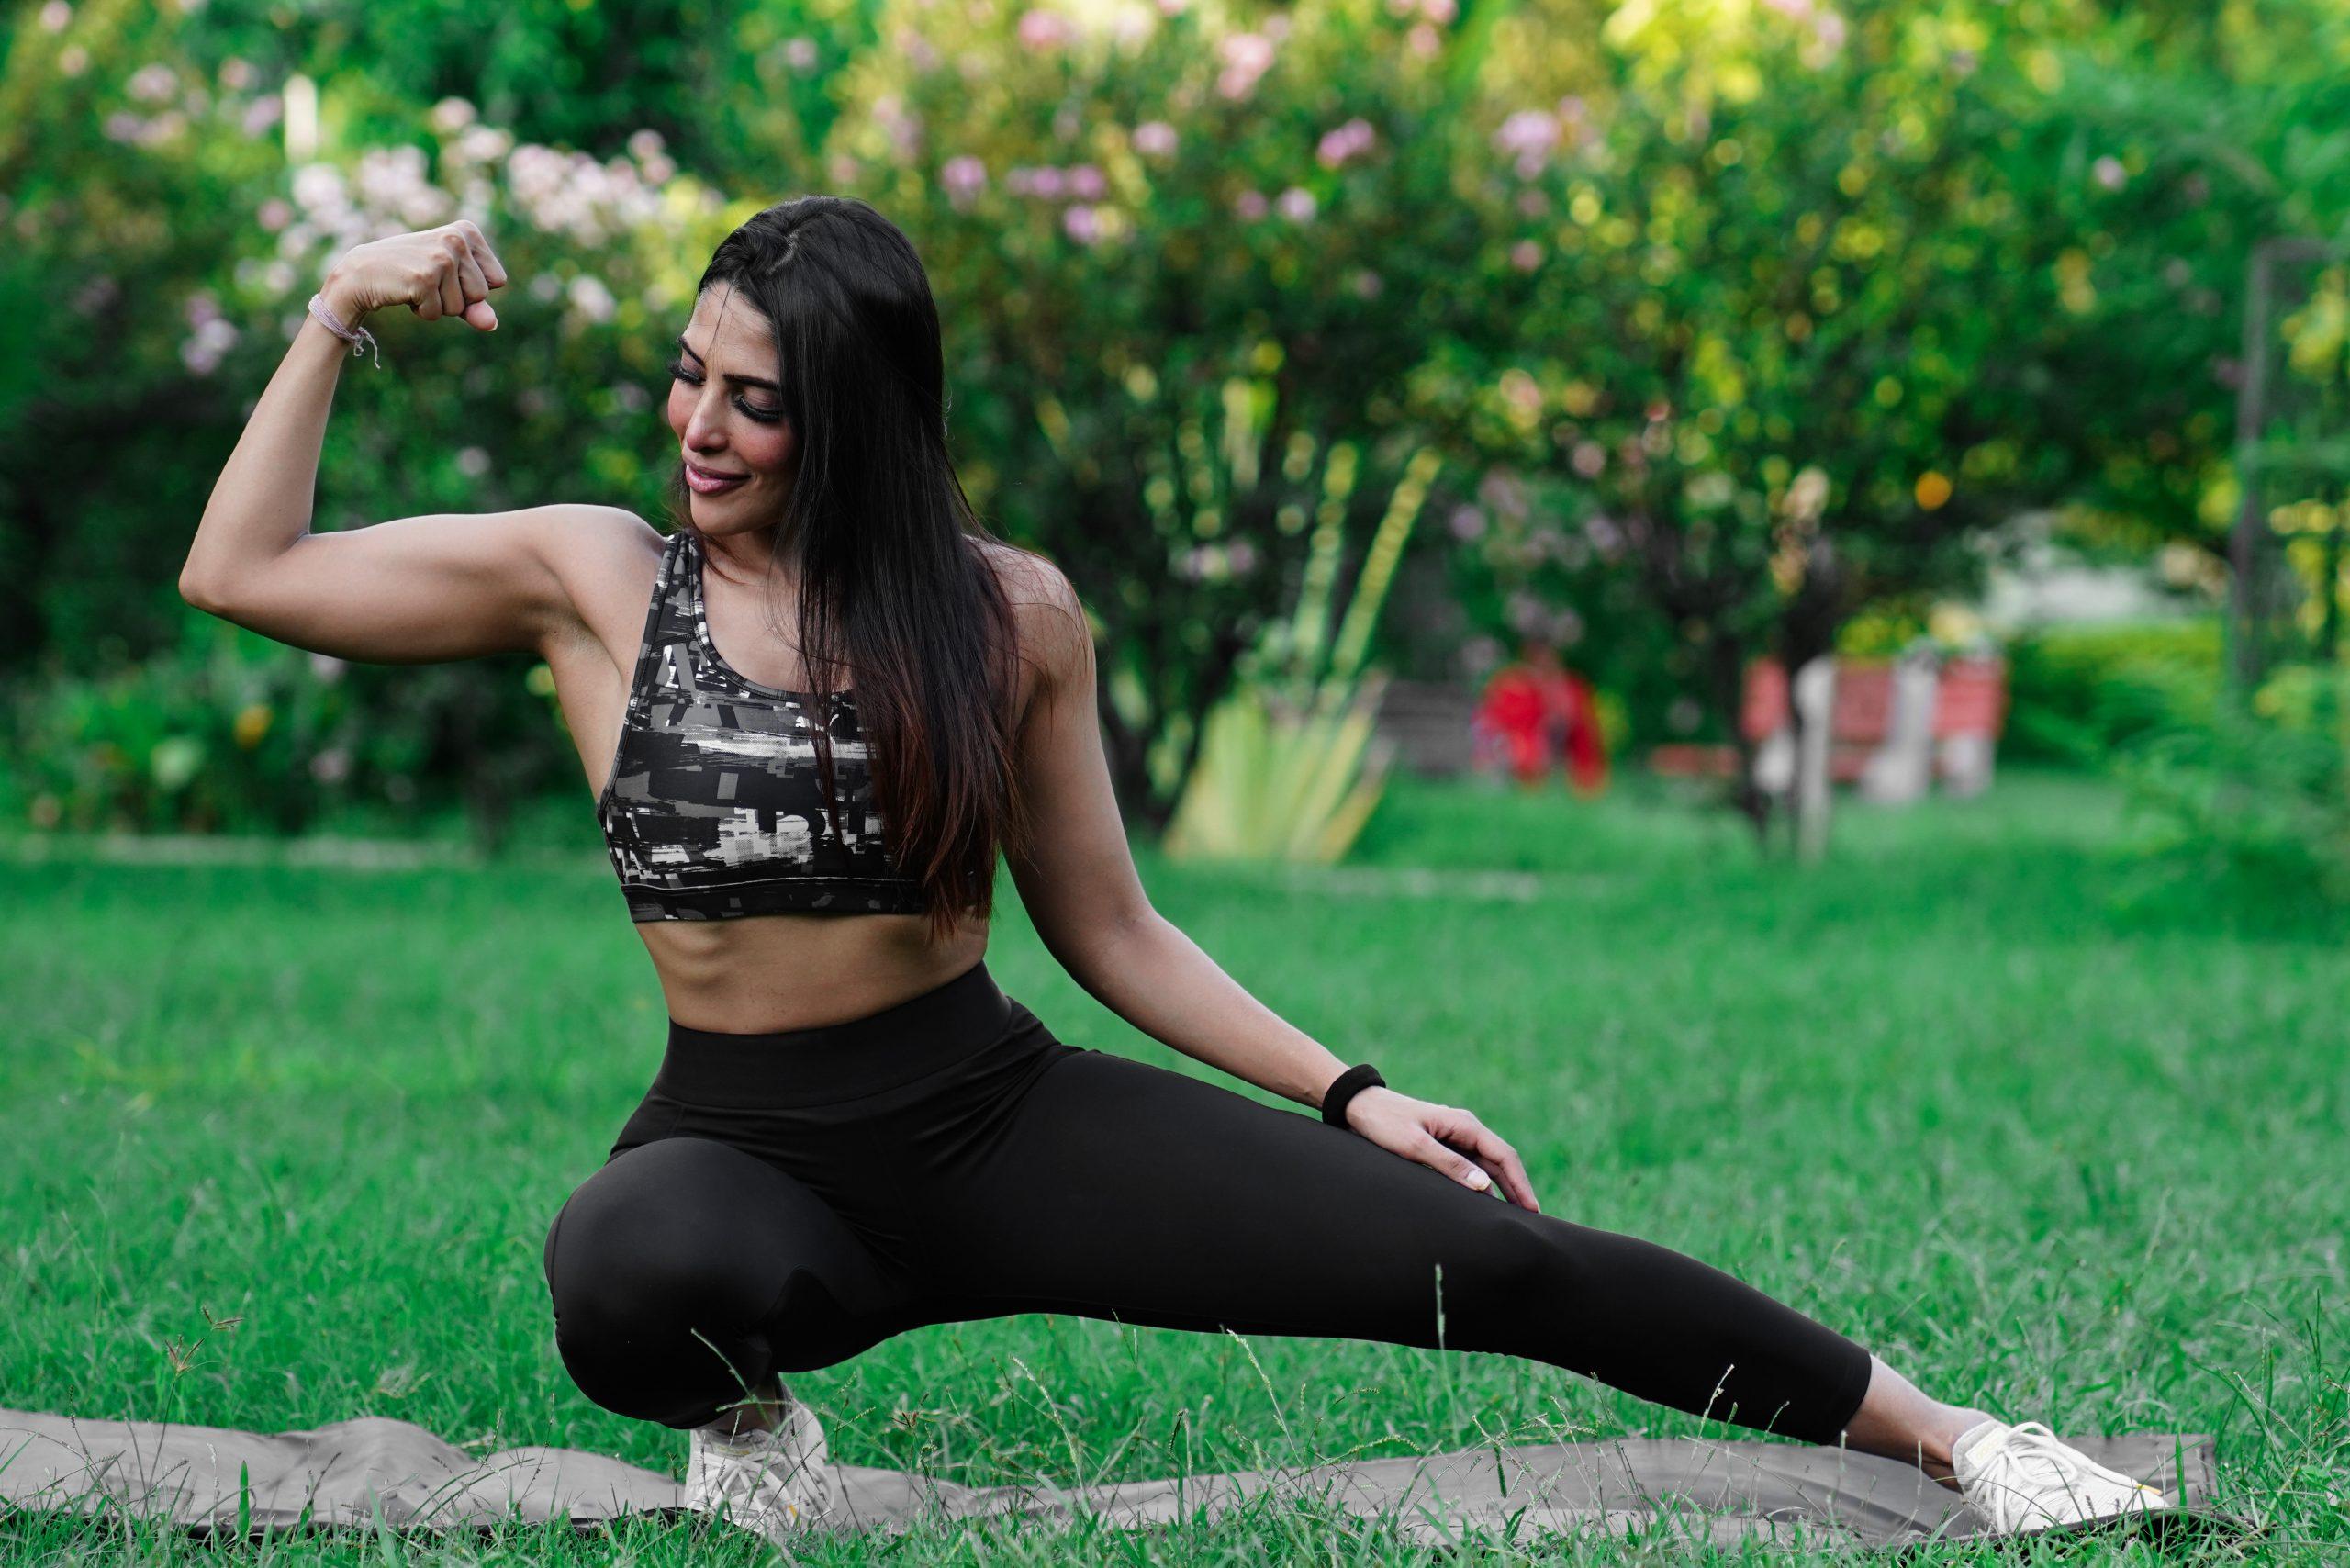 Female fitness model show her biceps in park